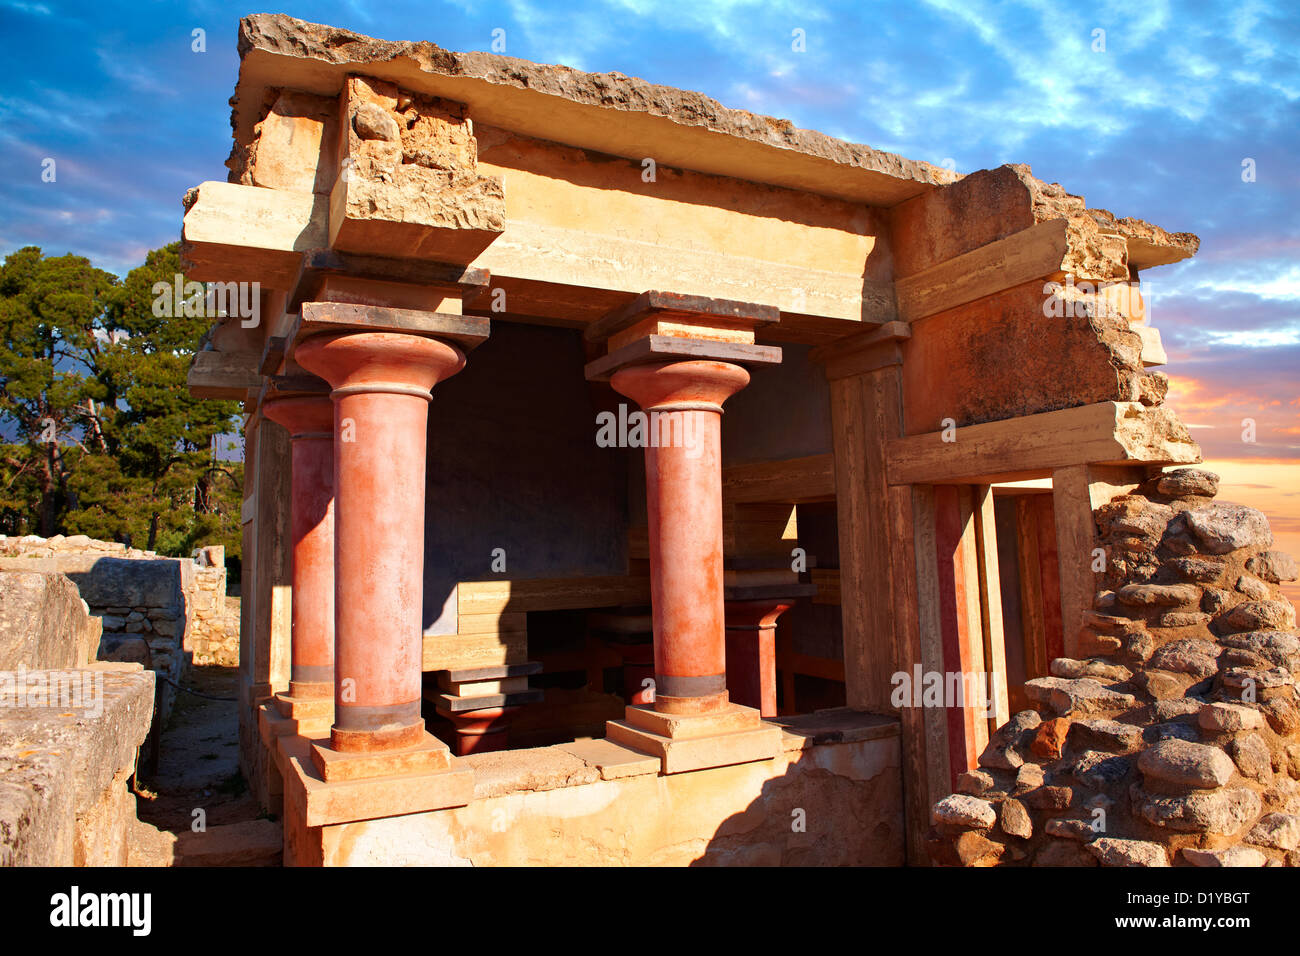 Arthur Evans reconstruction of Knossos Minoan Palace archaeological site, Crete - Stock Image